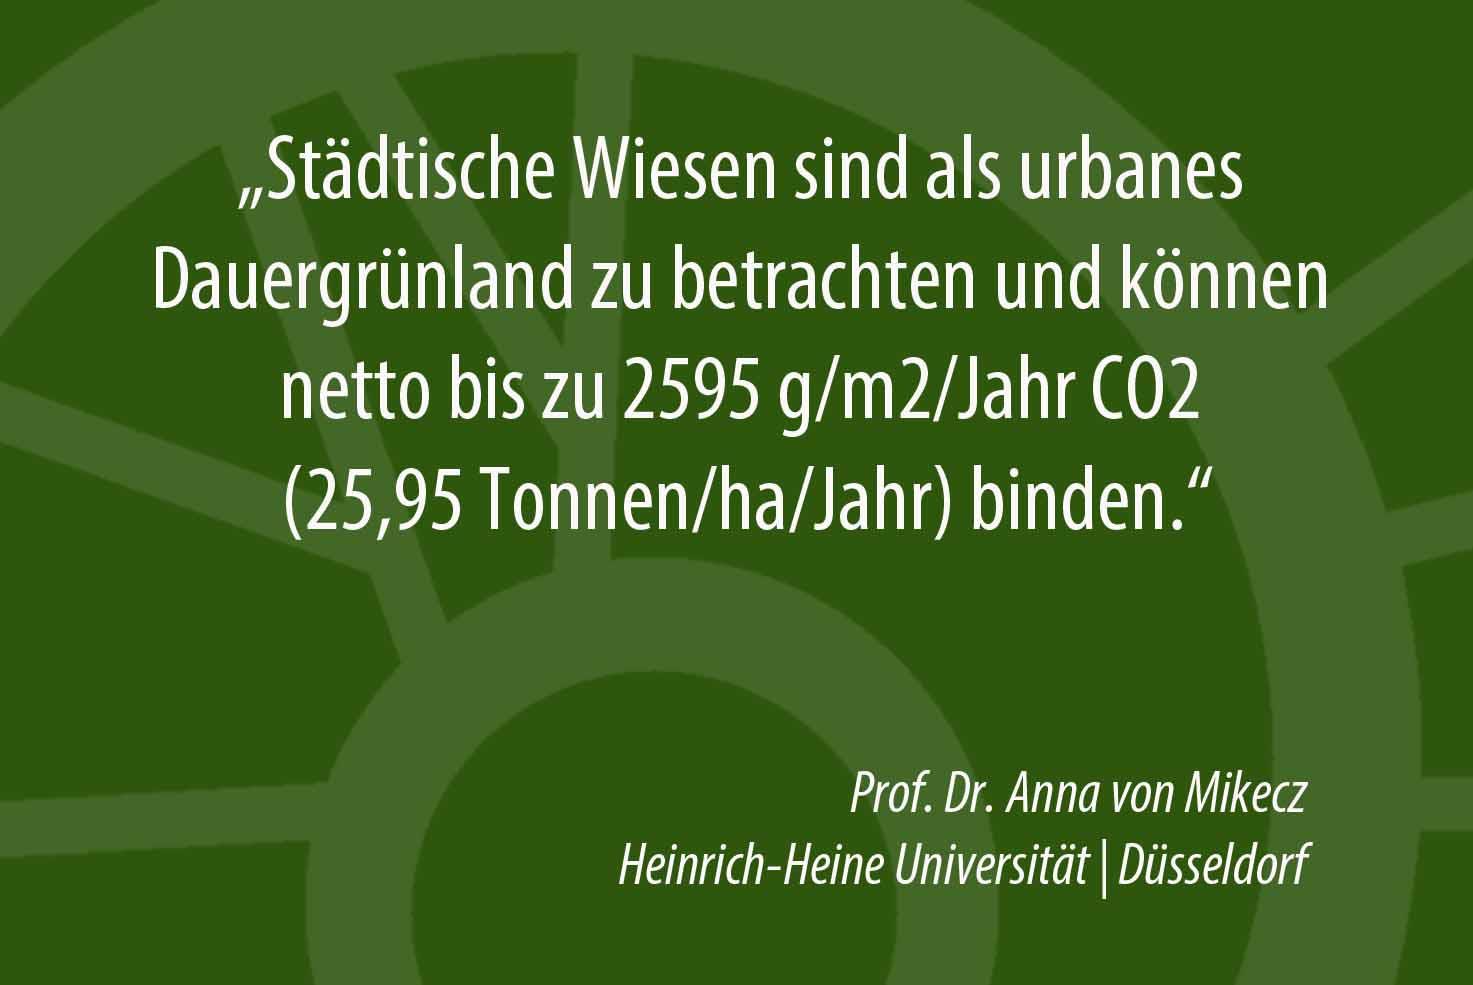 Urbanes_Dauergrünland.jpg